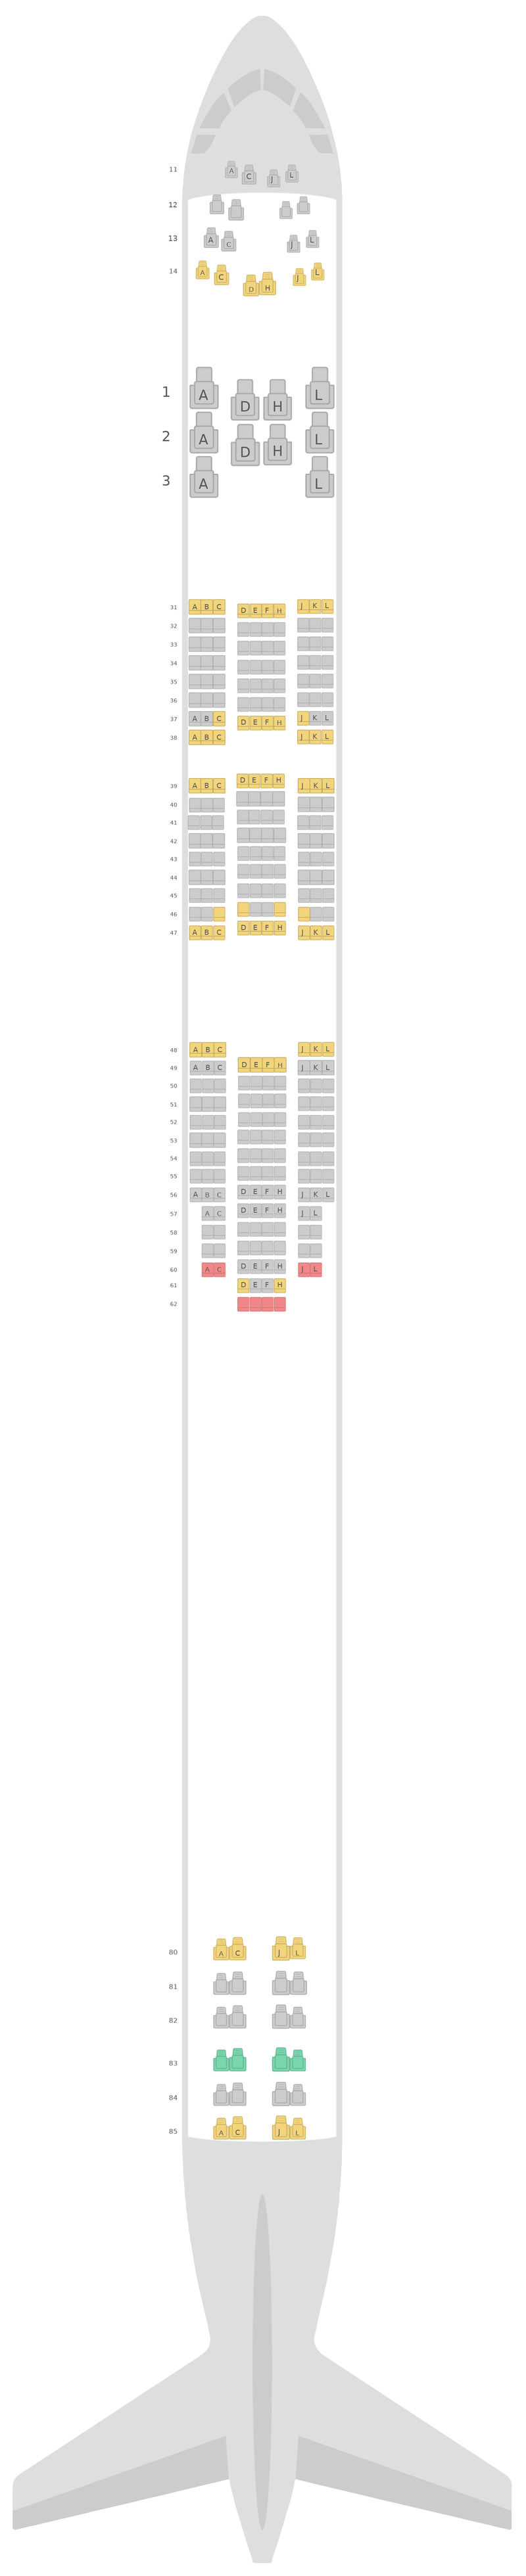 Mapa de asientos Boeing 747-400 (744) Air China